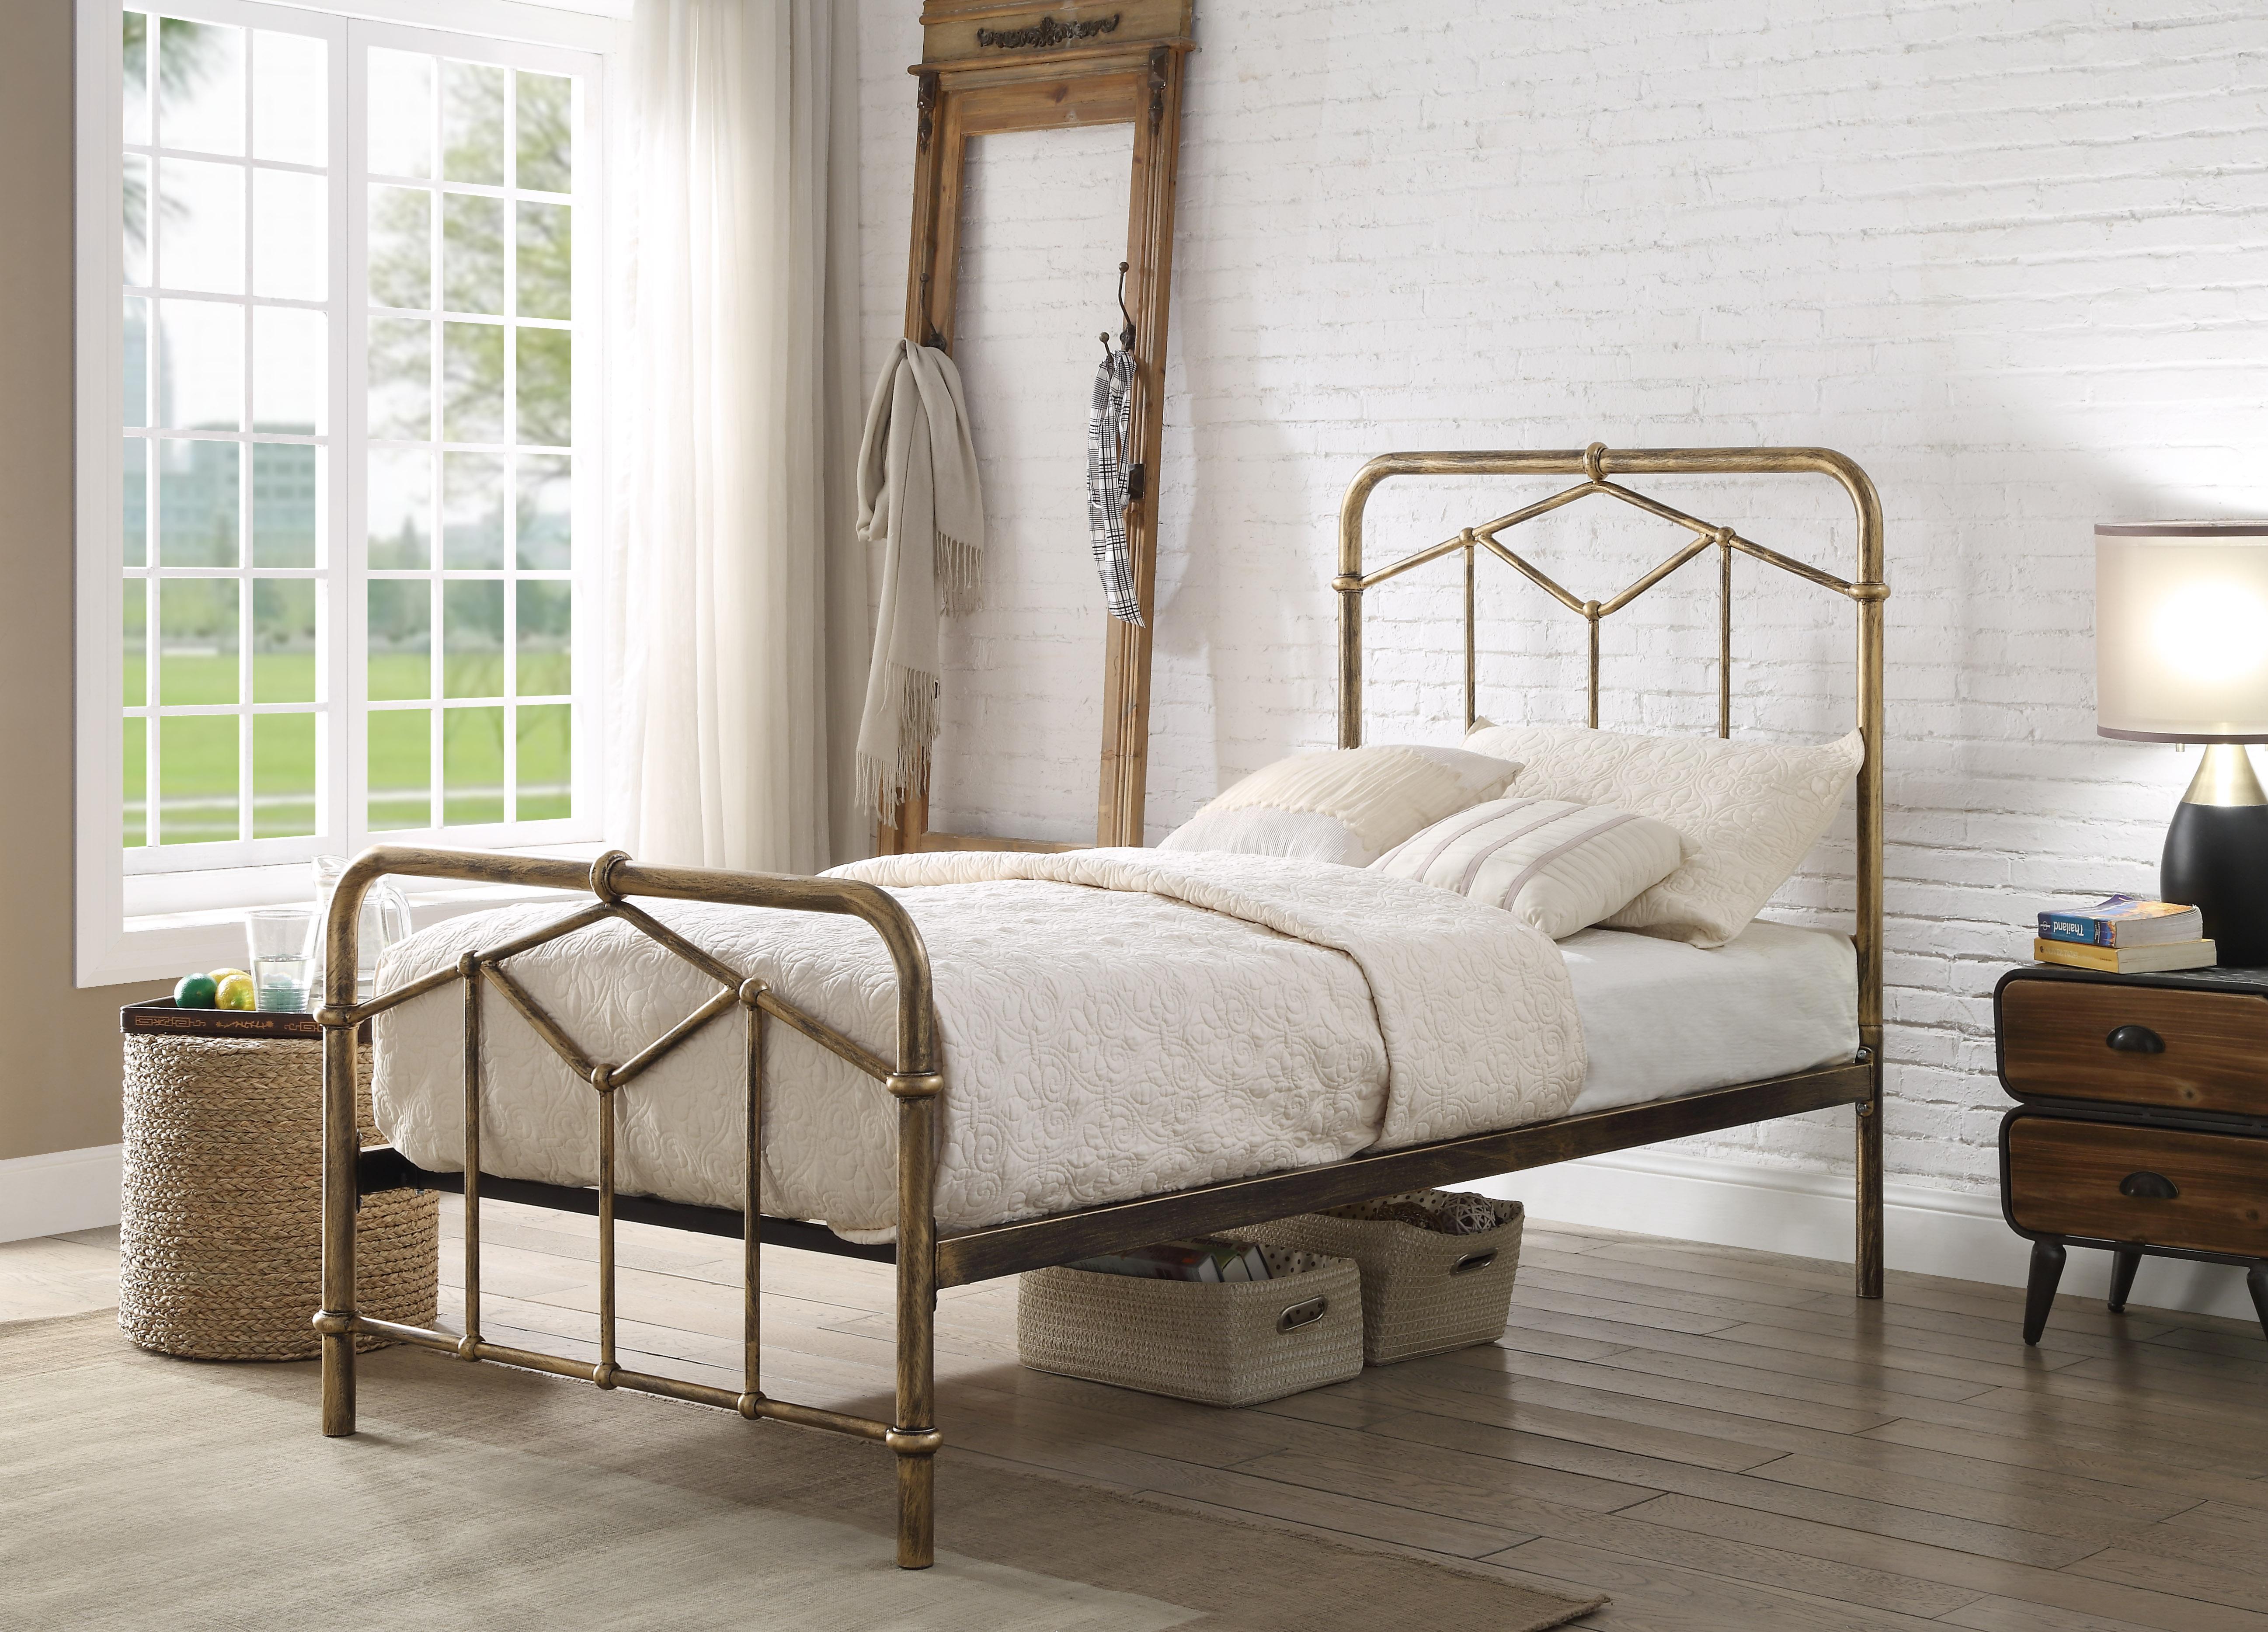 3ft Single Retro Bed Frame Antique Bronze Metal Rustic Industrial Tubular Helibeds